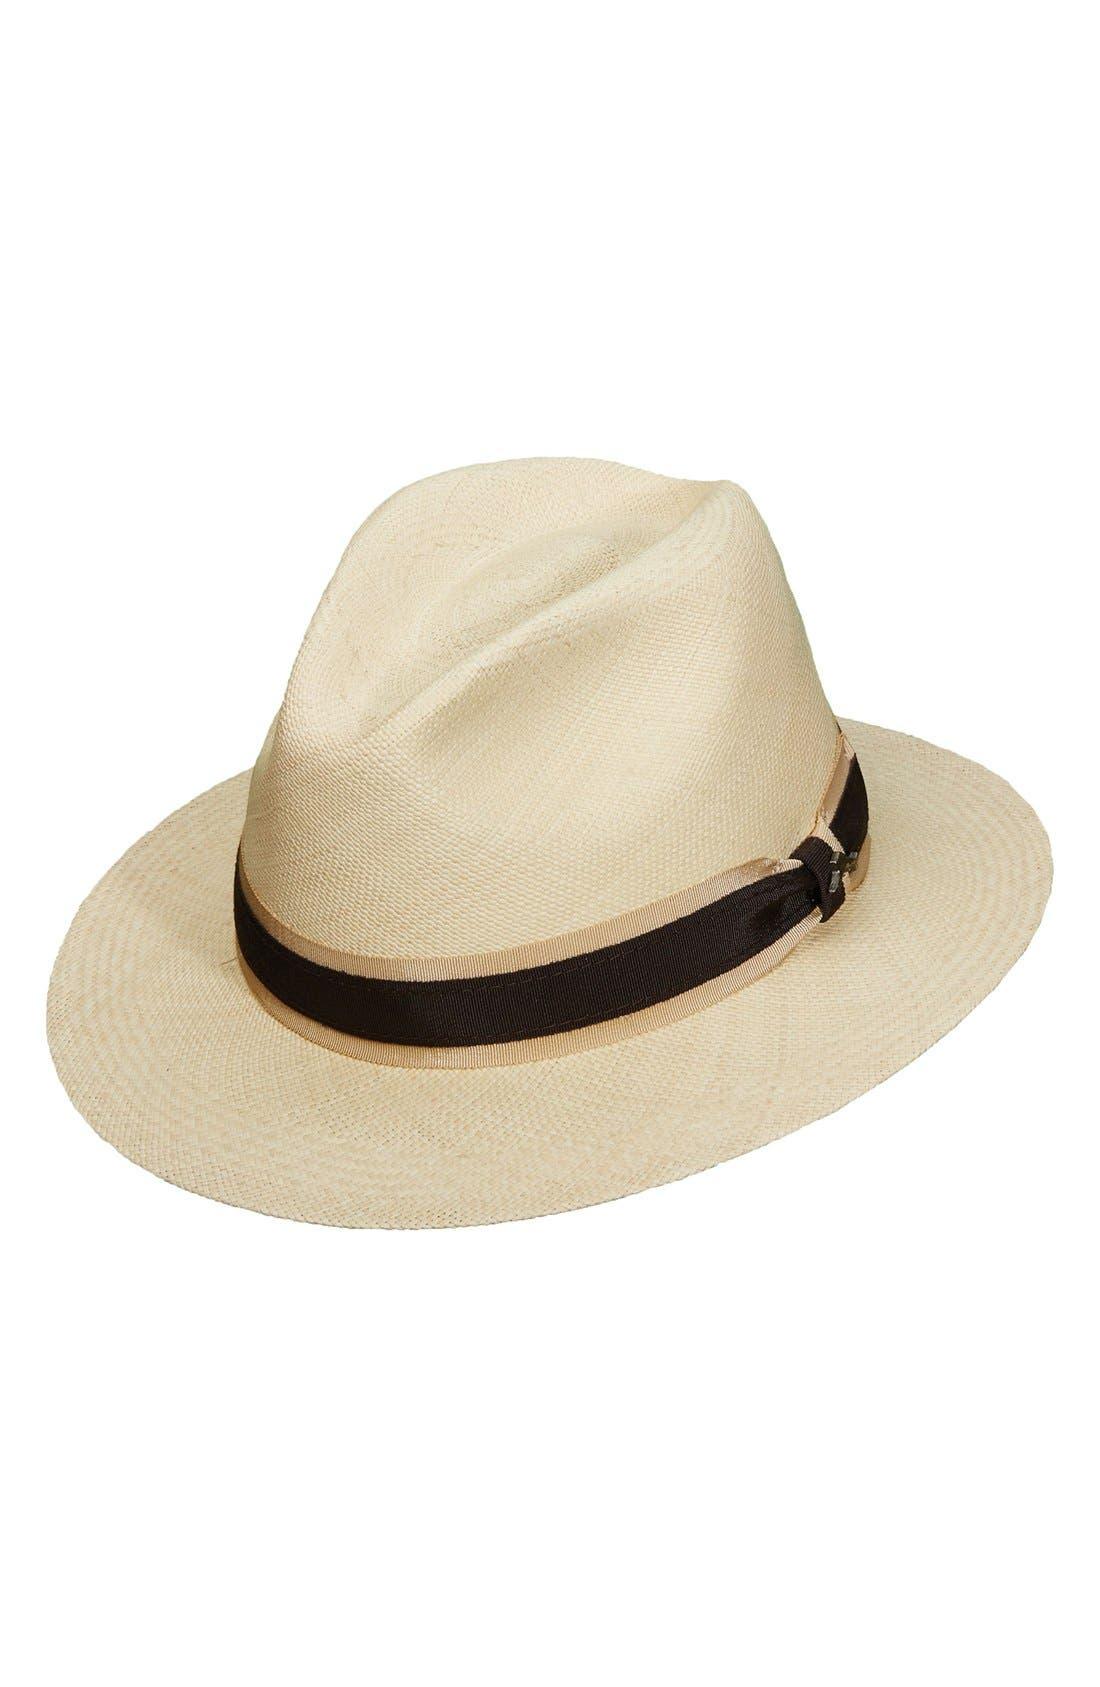 Alternate Image 1 Selected - Tommy Bahama Panama Straw Safari Hat